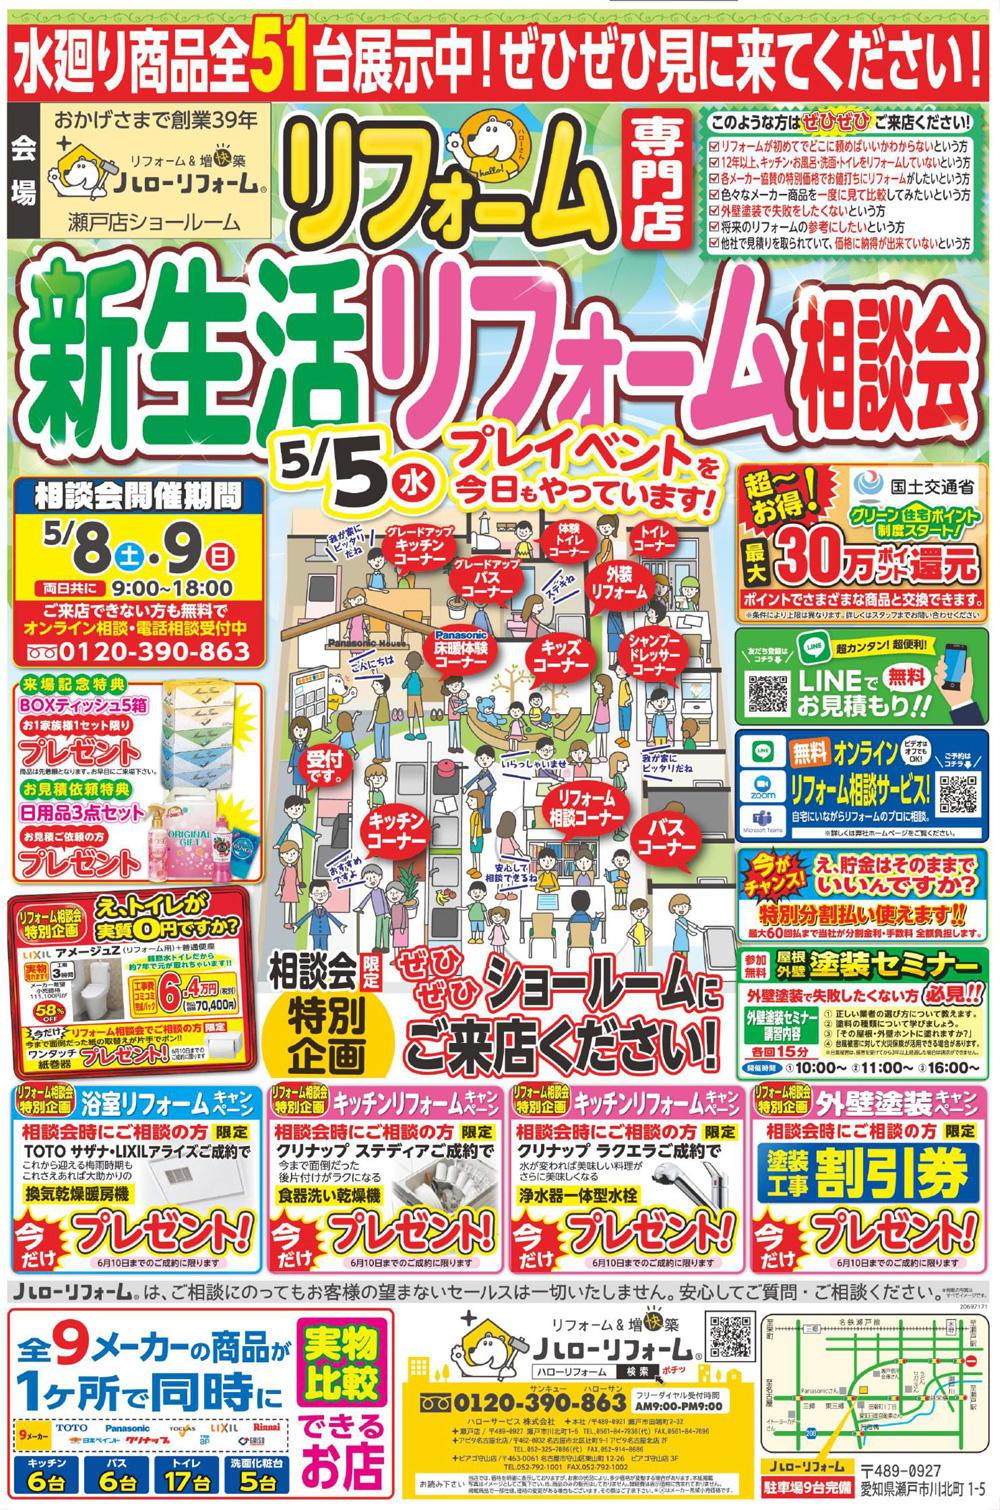 新生活リフォーム相談会(瀬戸店)